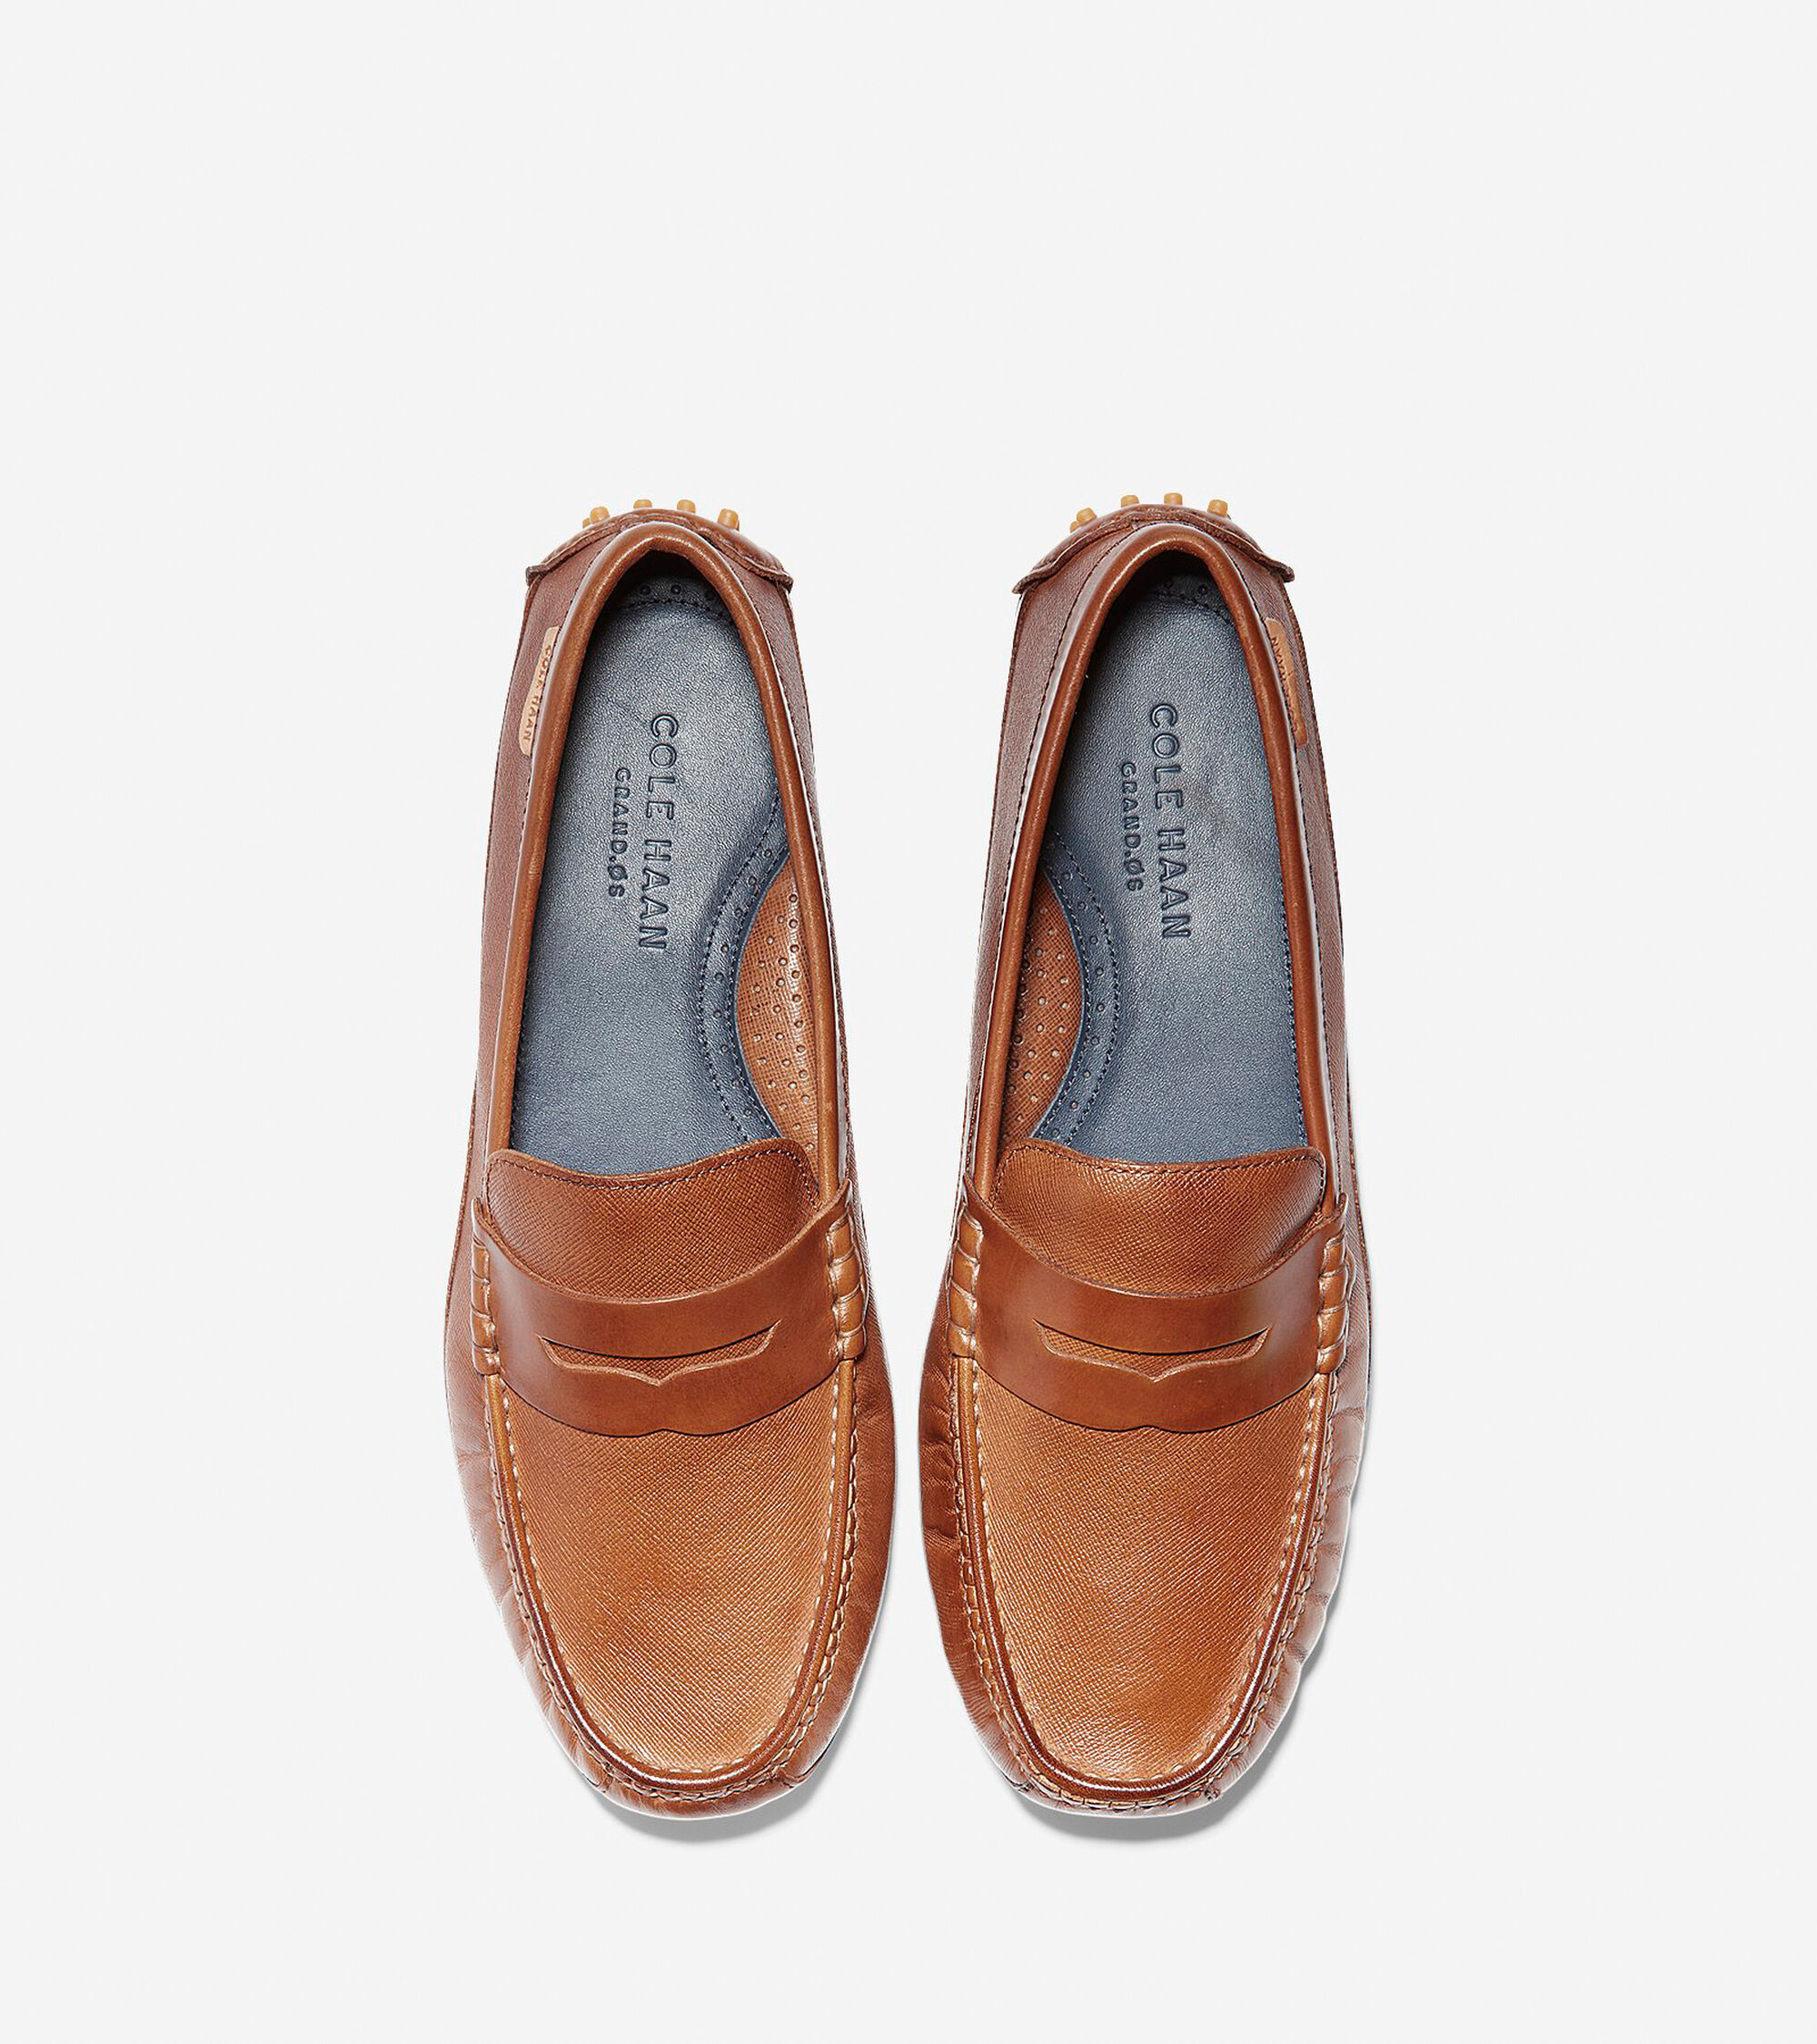 cdbced85d95 Men s Coburn Penny Driving Shoes in British Tan